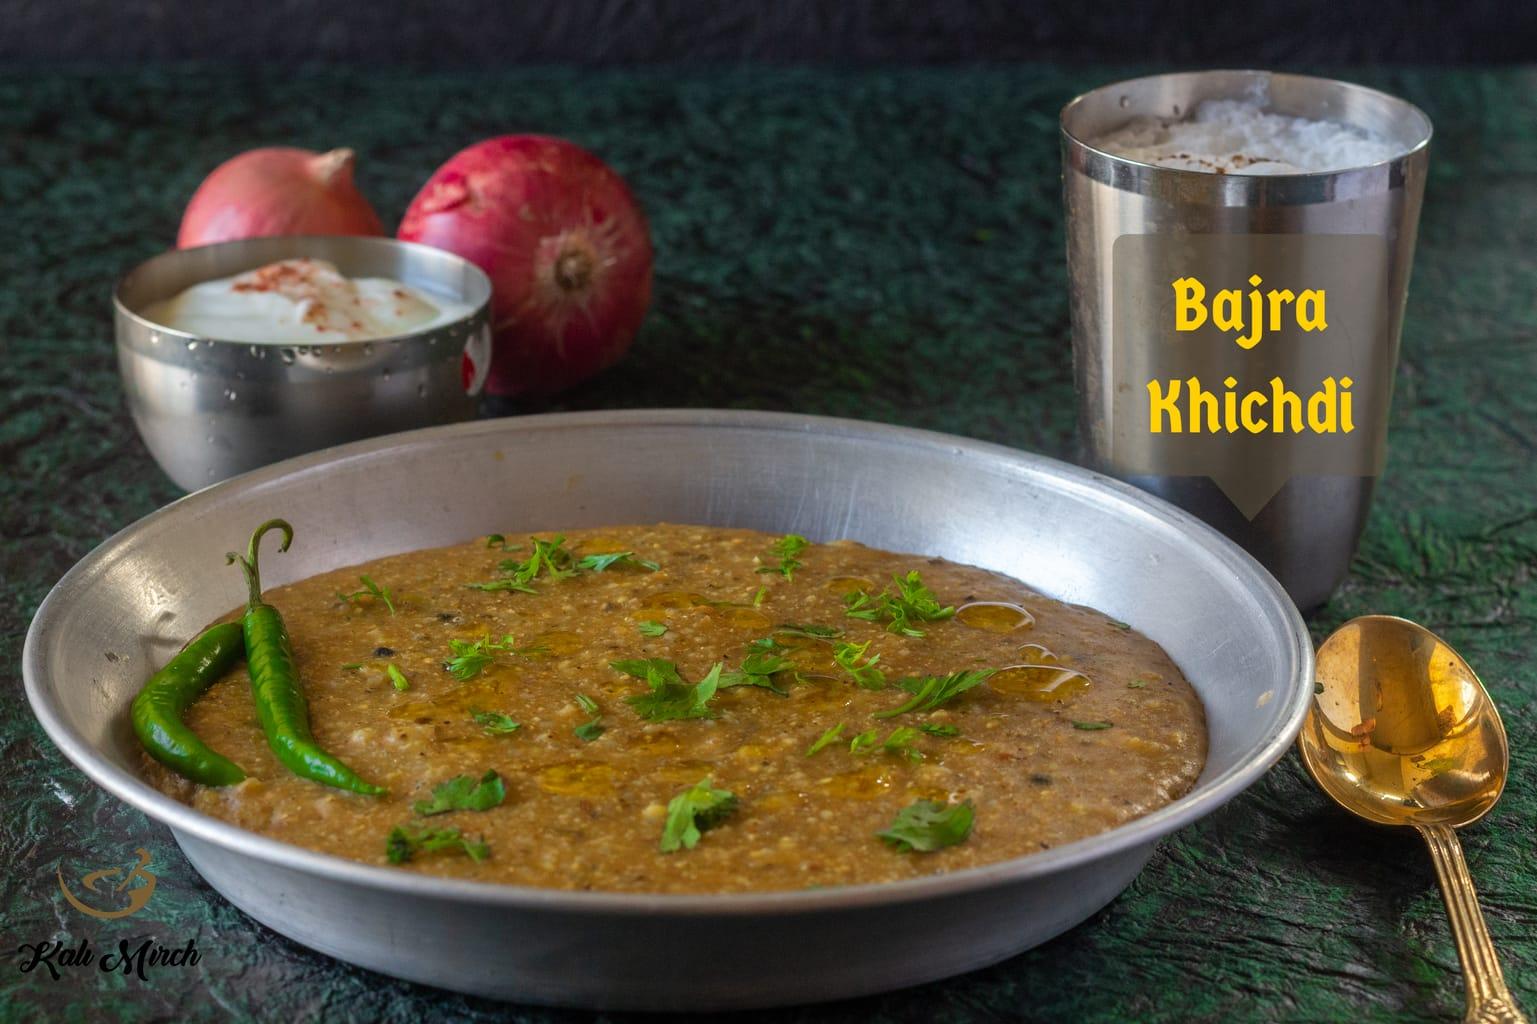 Bajra Khichdi-How to make Bajra Khichdi